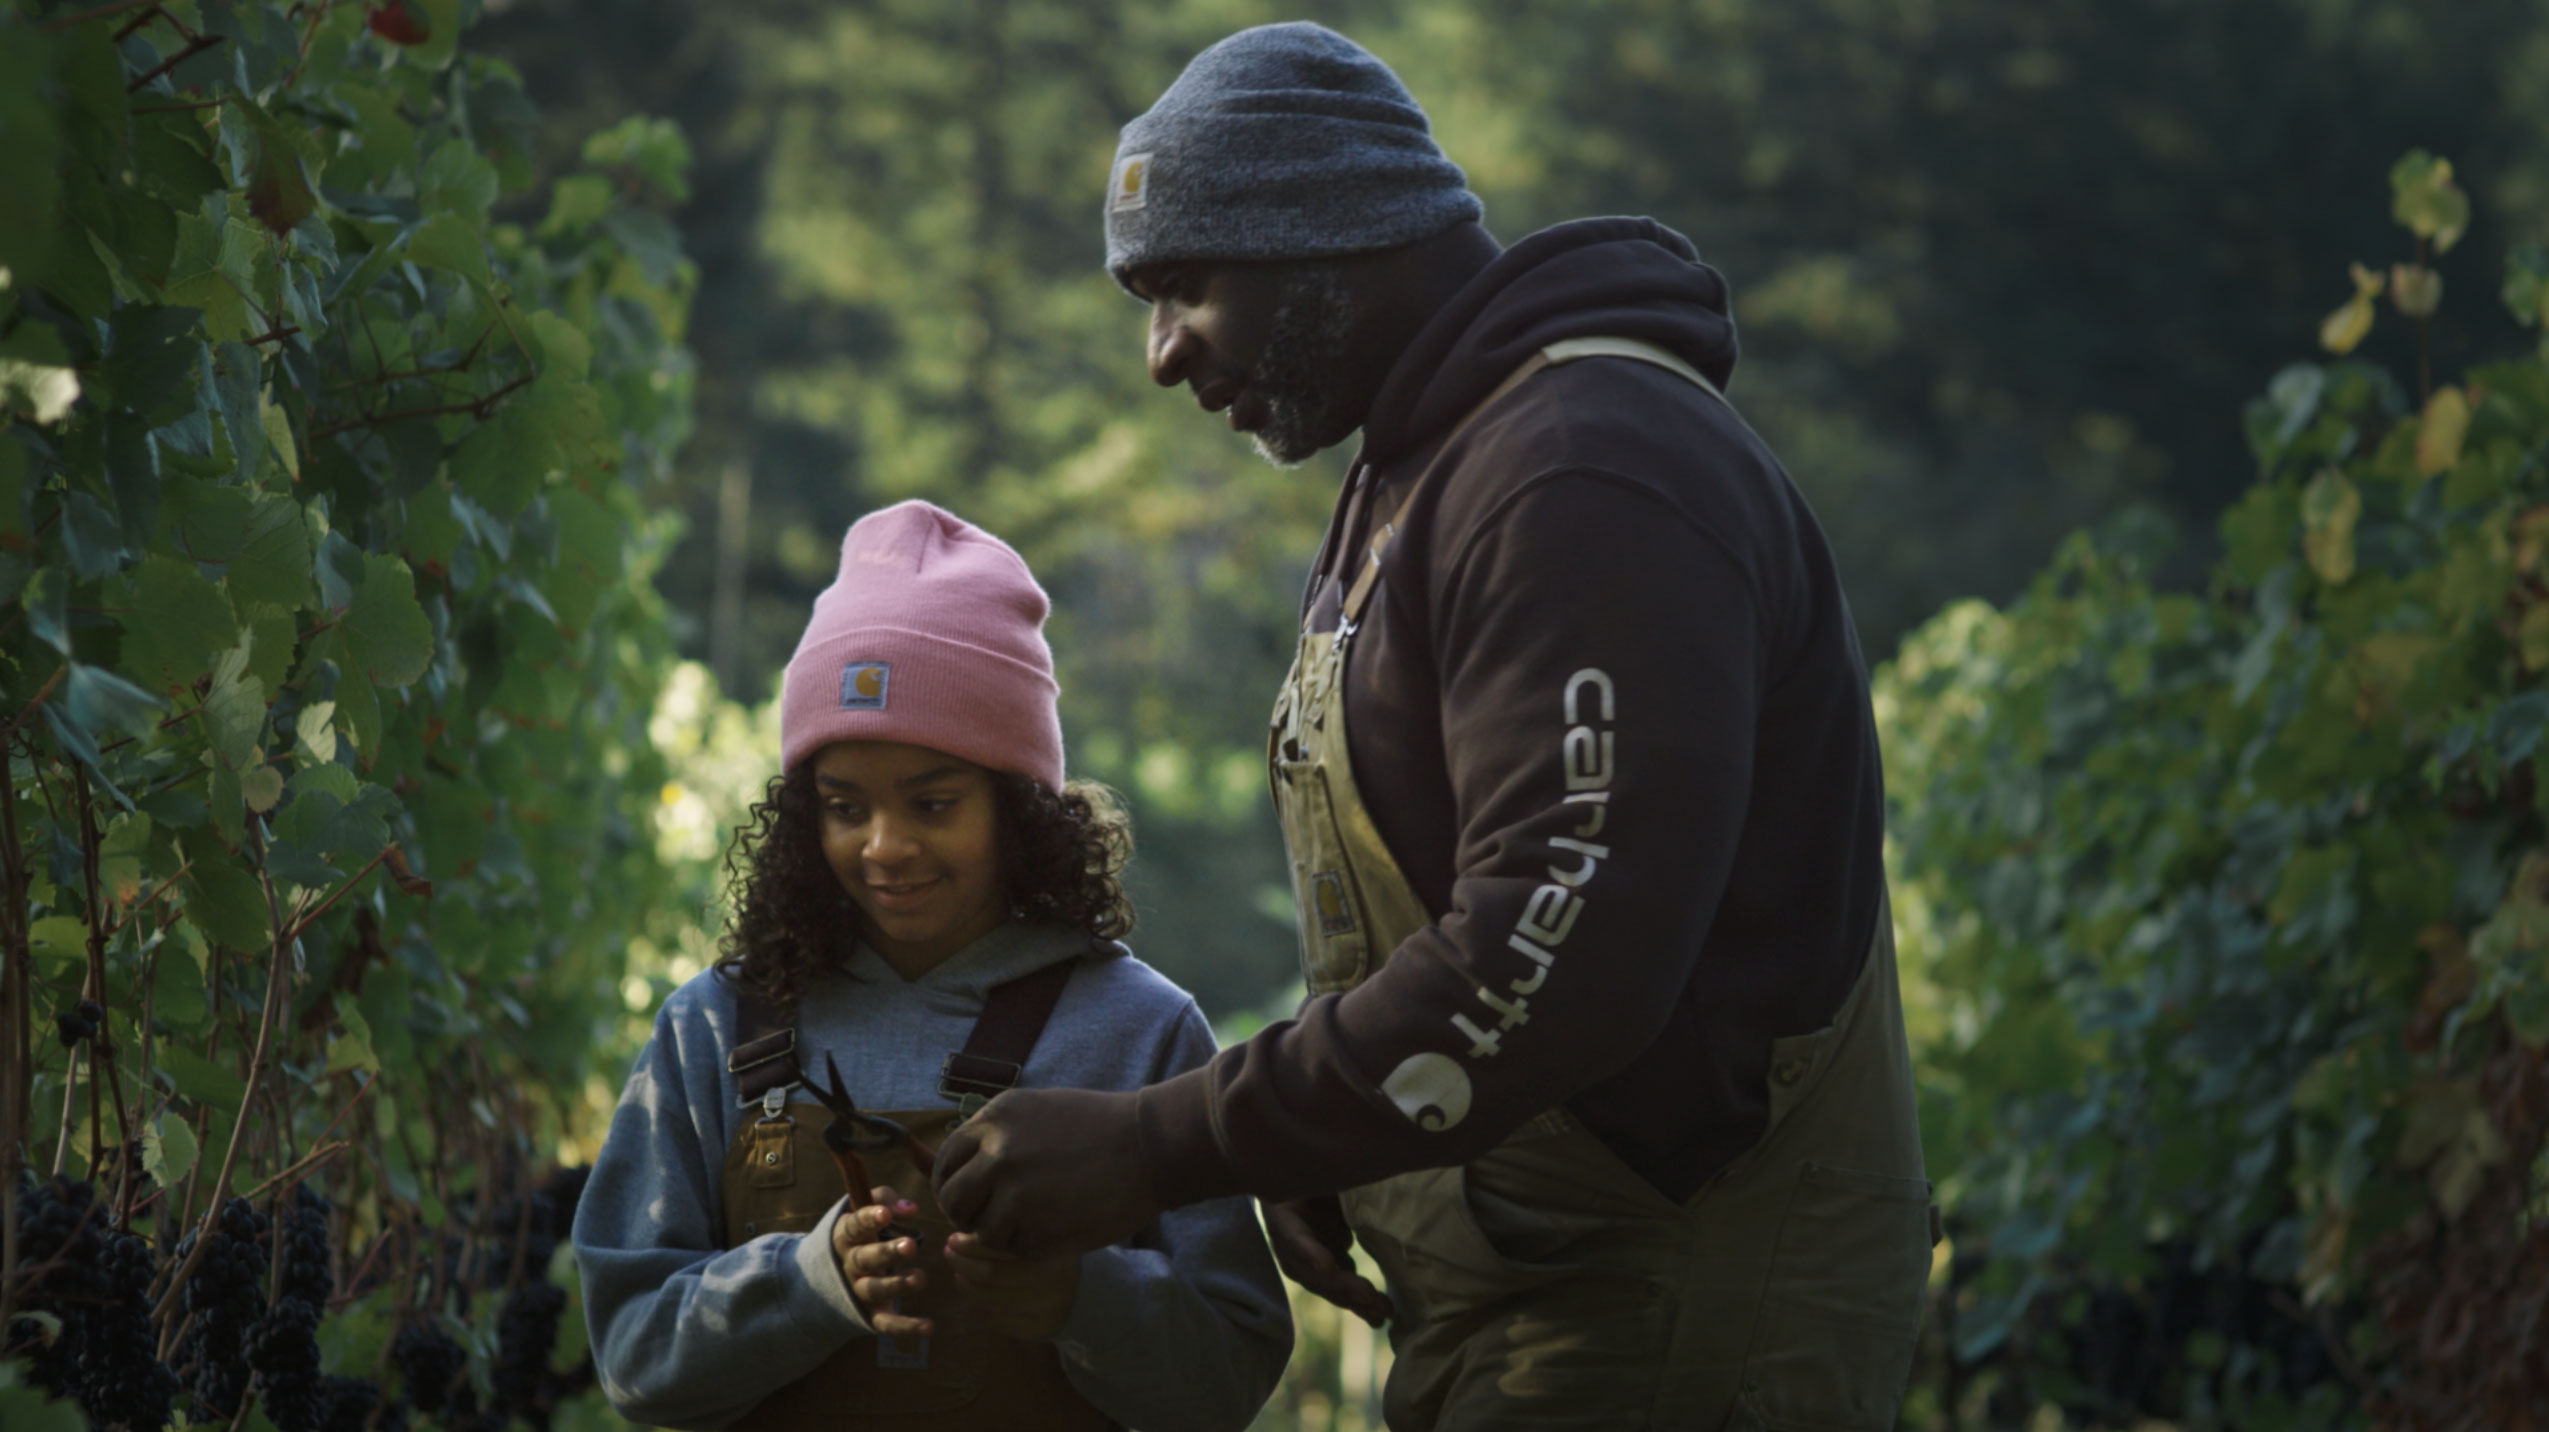 Carhartt Mentor Campaign - Vineyard